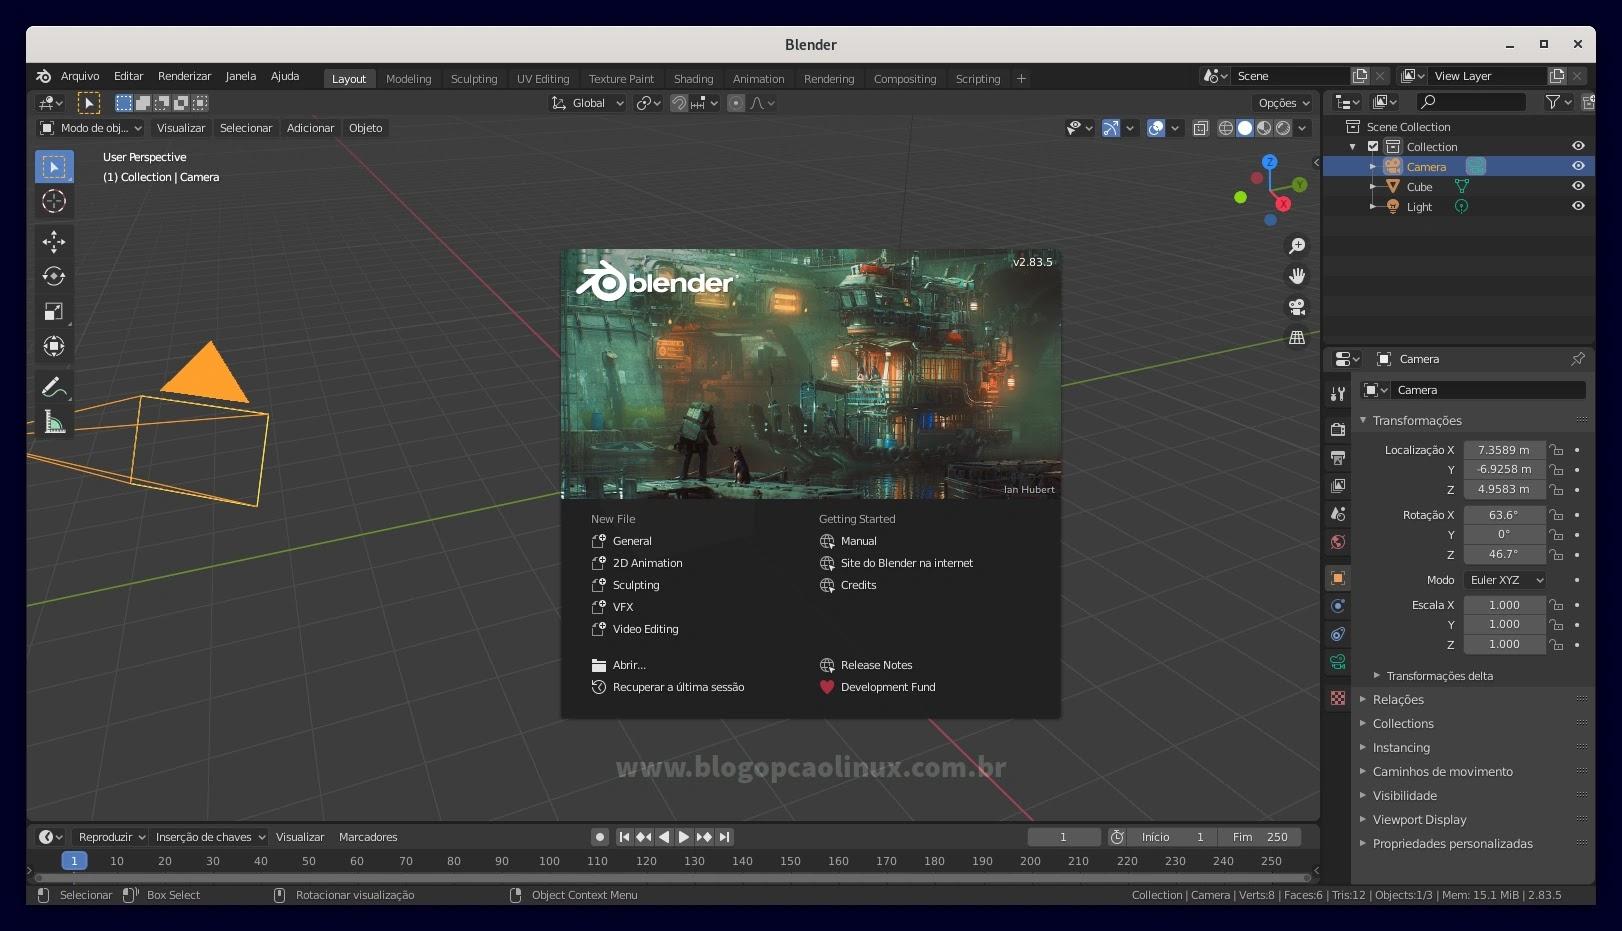 Blender executando no Debian 11 Bullseye